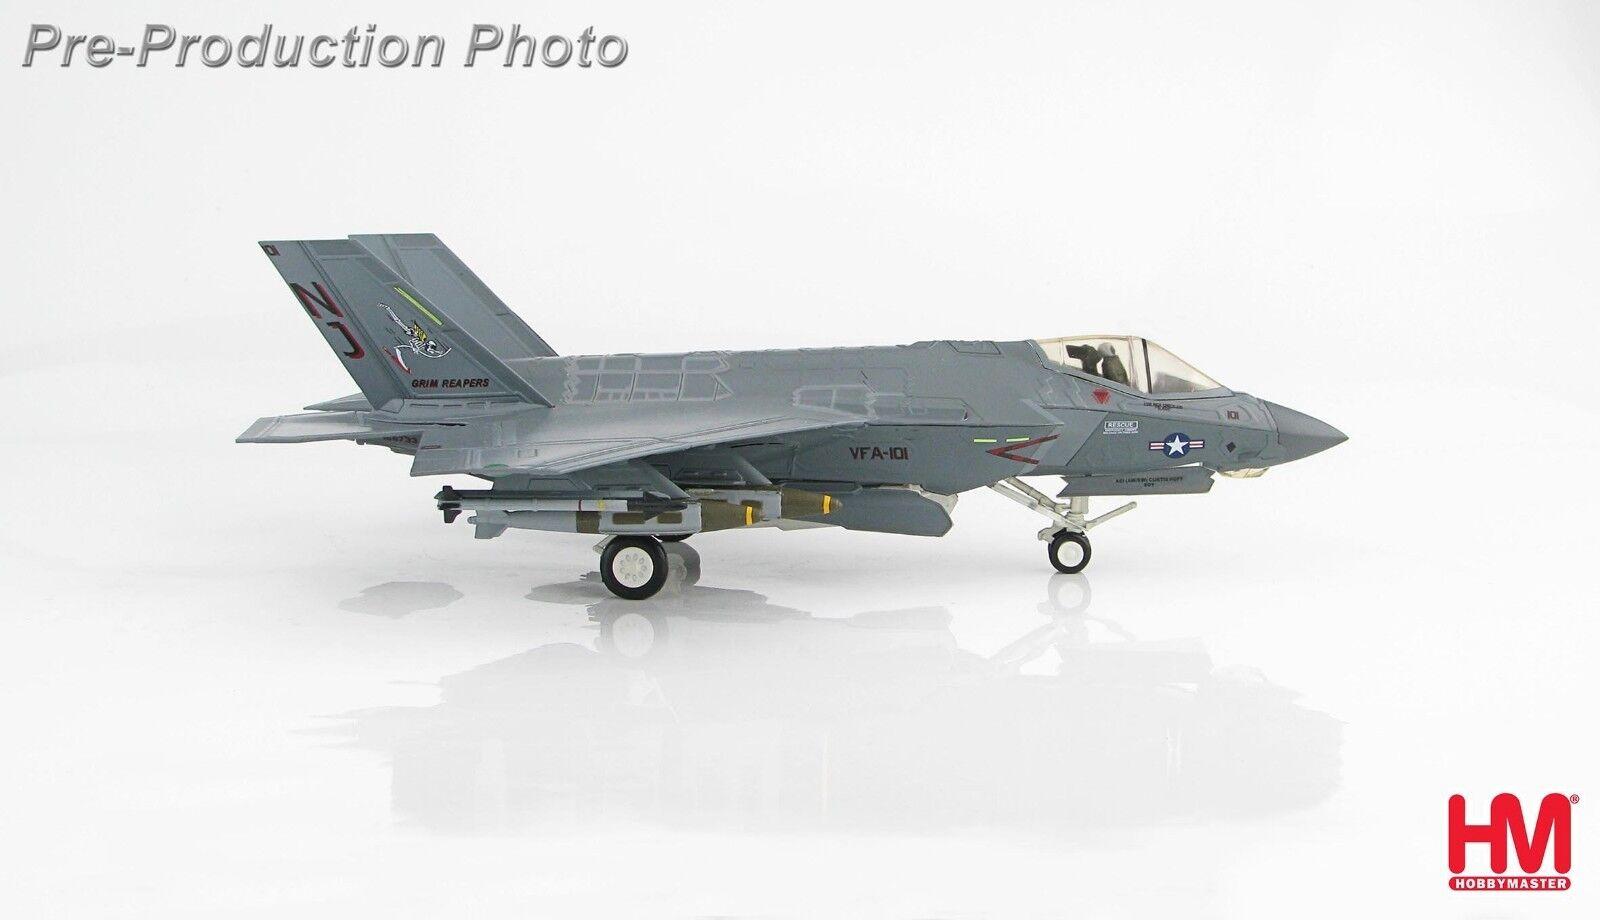 Hobby Master HA6201, Lockheed Martin F-35C Lightning Ii 101, VFA-101  Grim reape